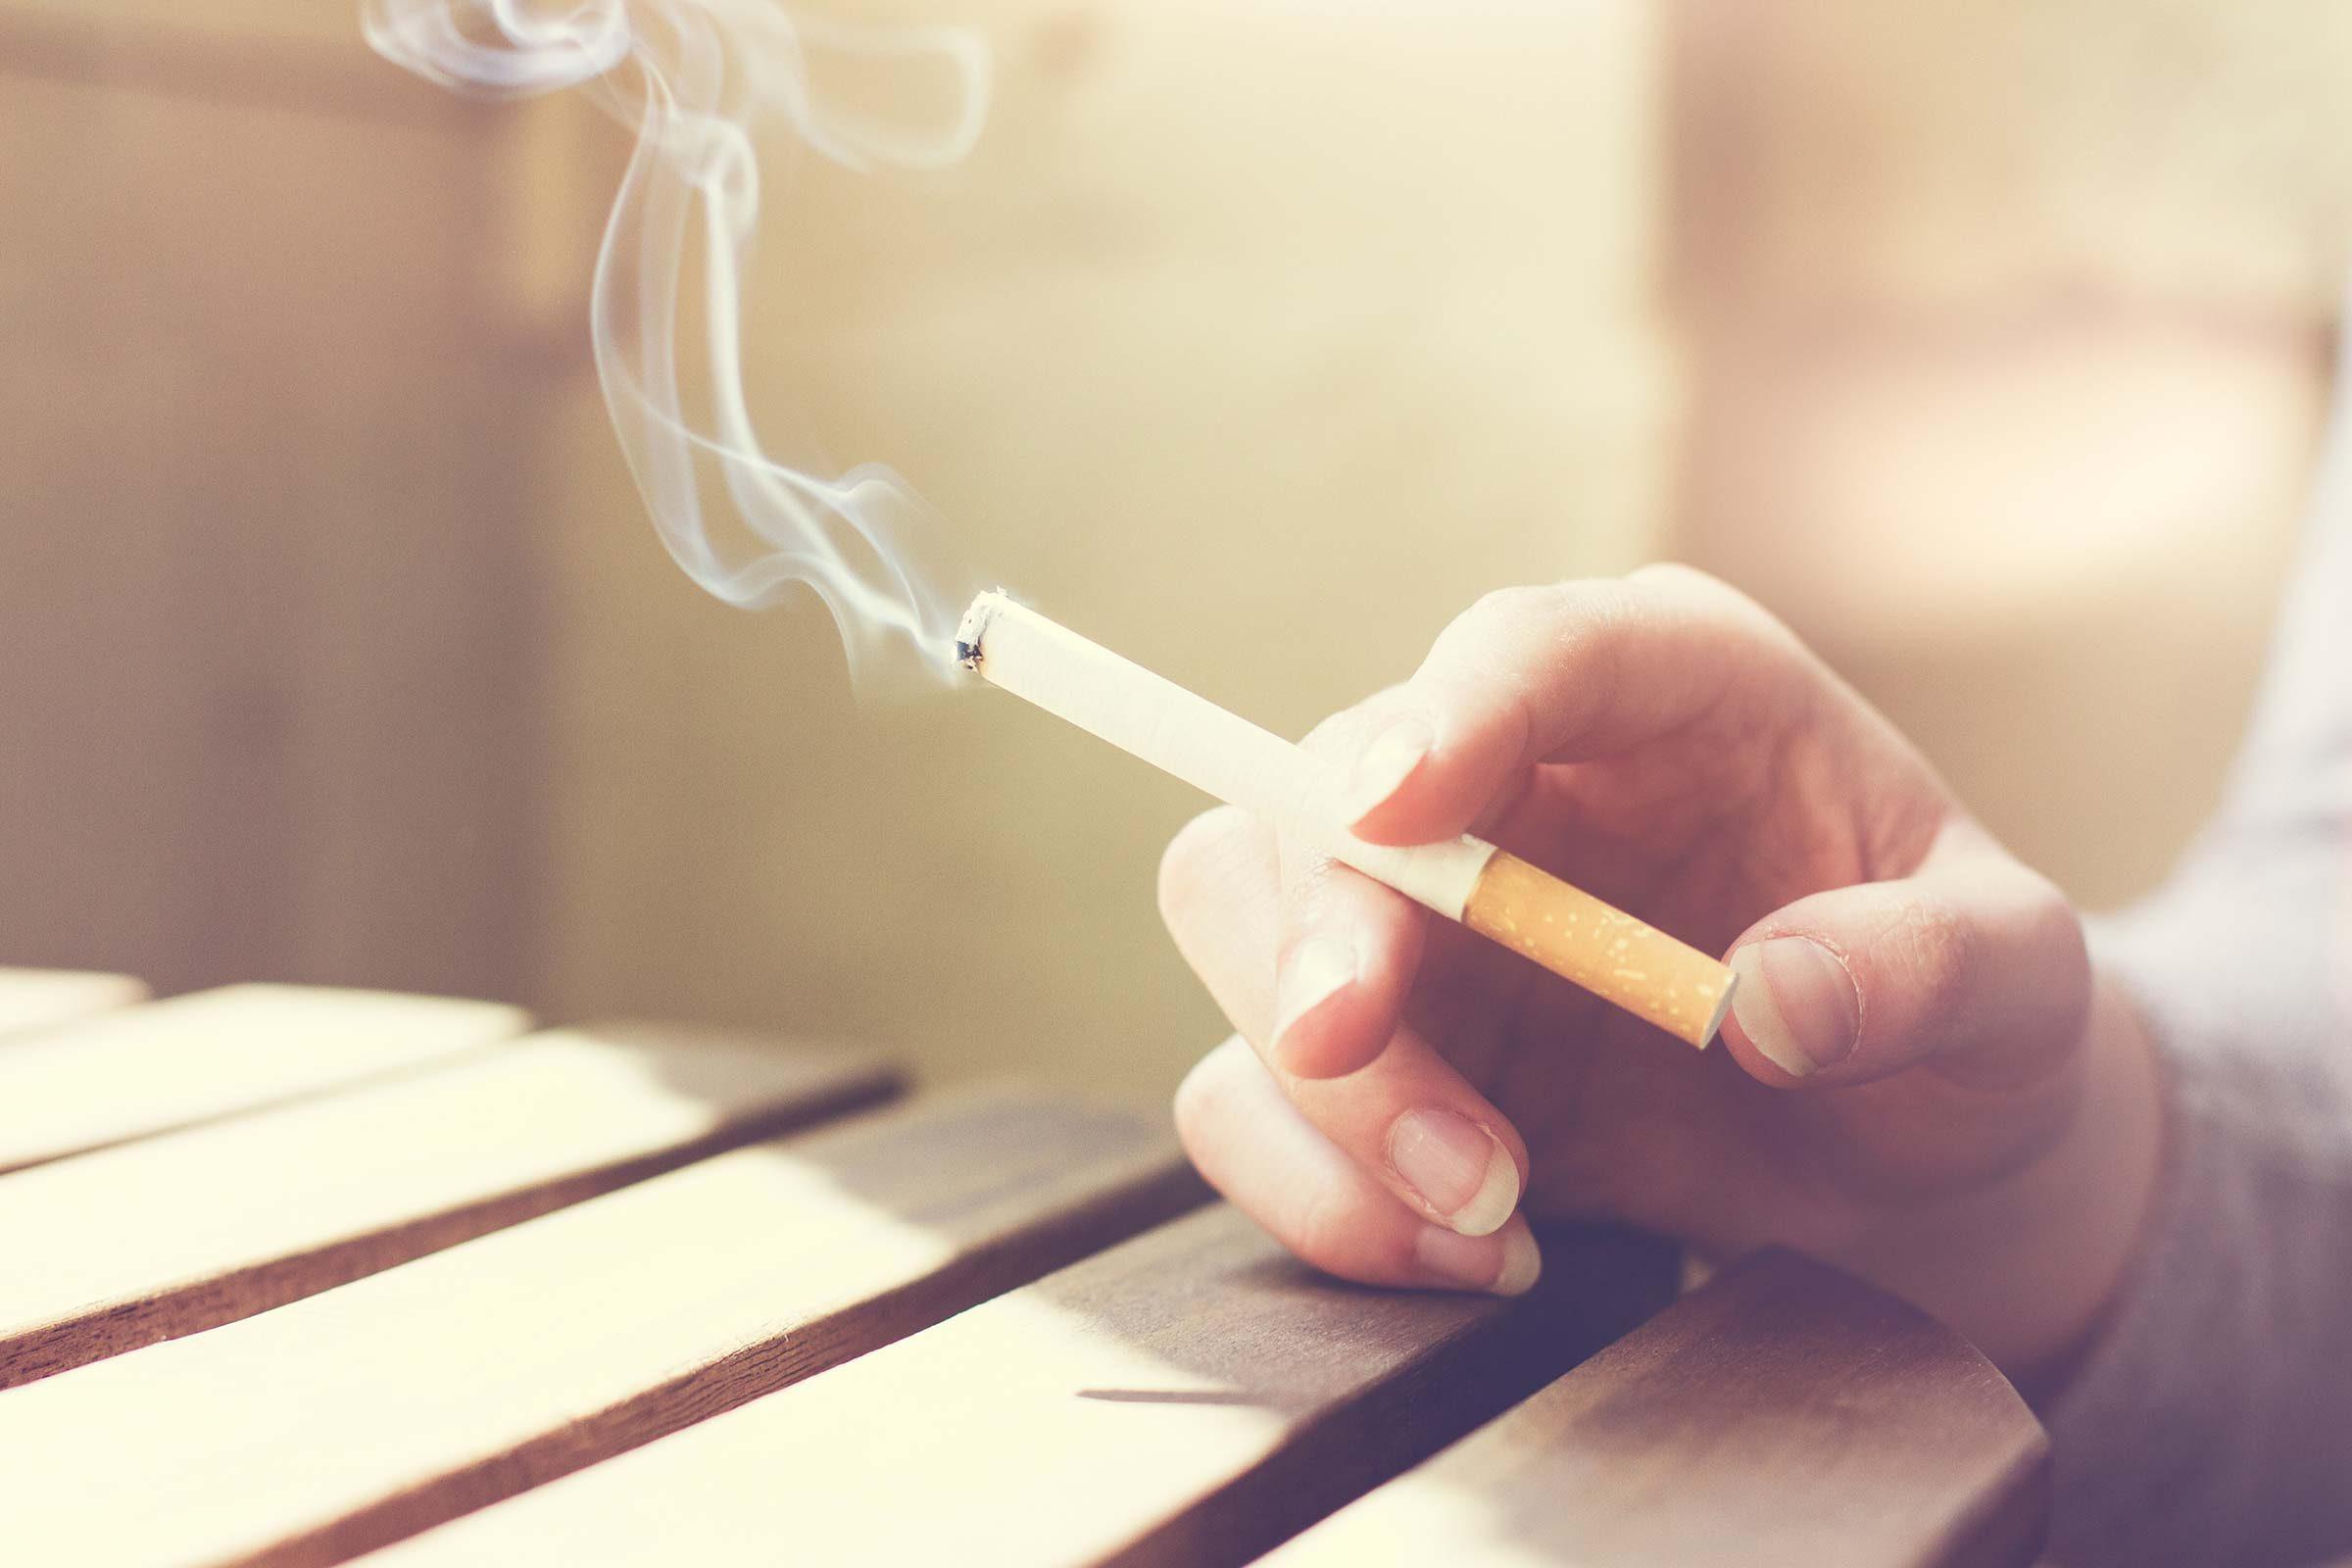 01-cigarette-everyday-things-harming-fertility-Robert-Herhold